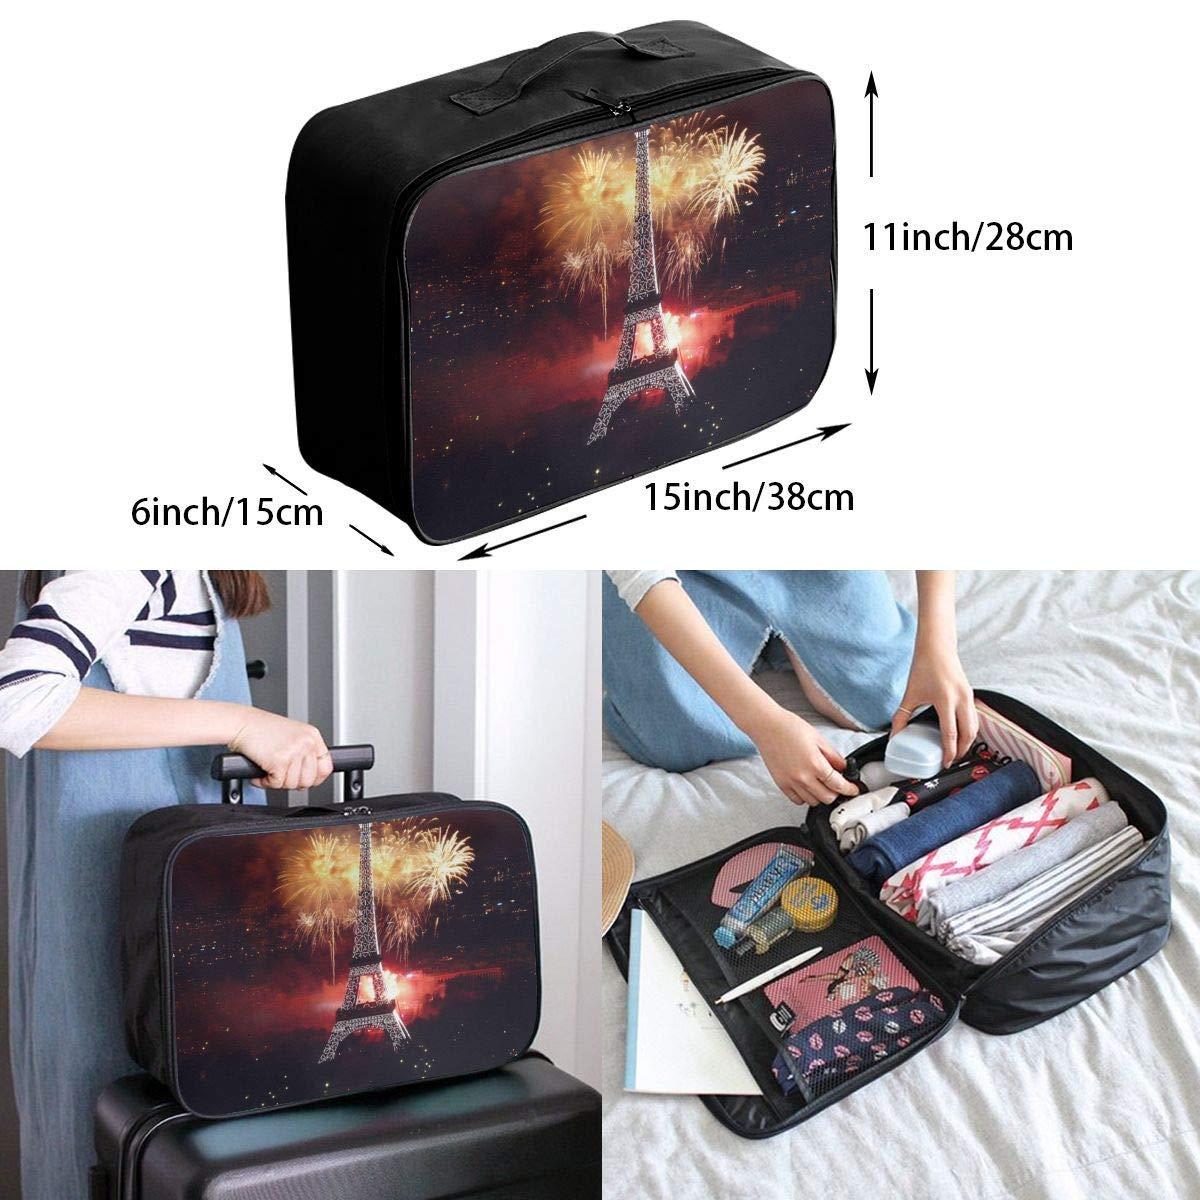 JTRVW Luggage Bags for Travel Lightweight Large Capacity Portable Duffel Bag for Men /& Women Eiffel Tower Fireworks Travel Duffel Bag Backpack